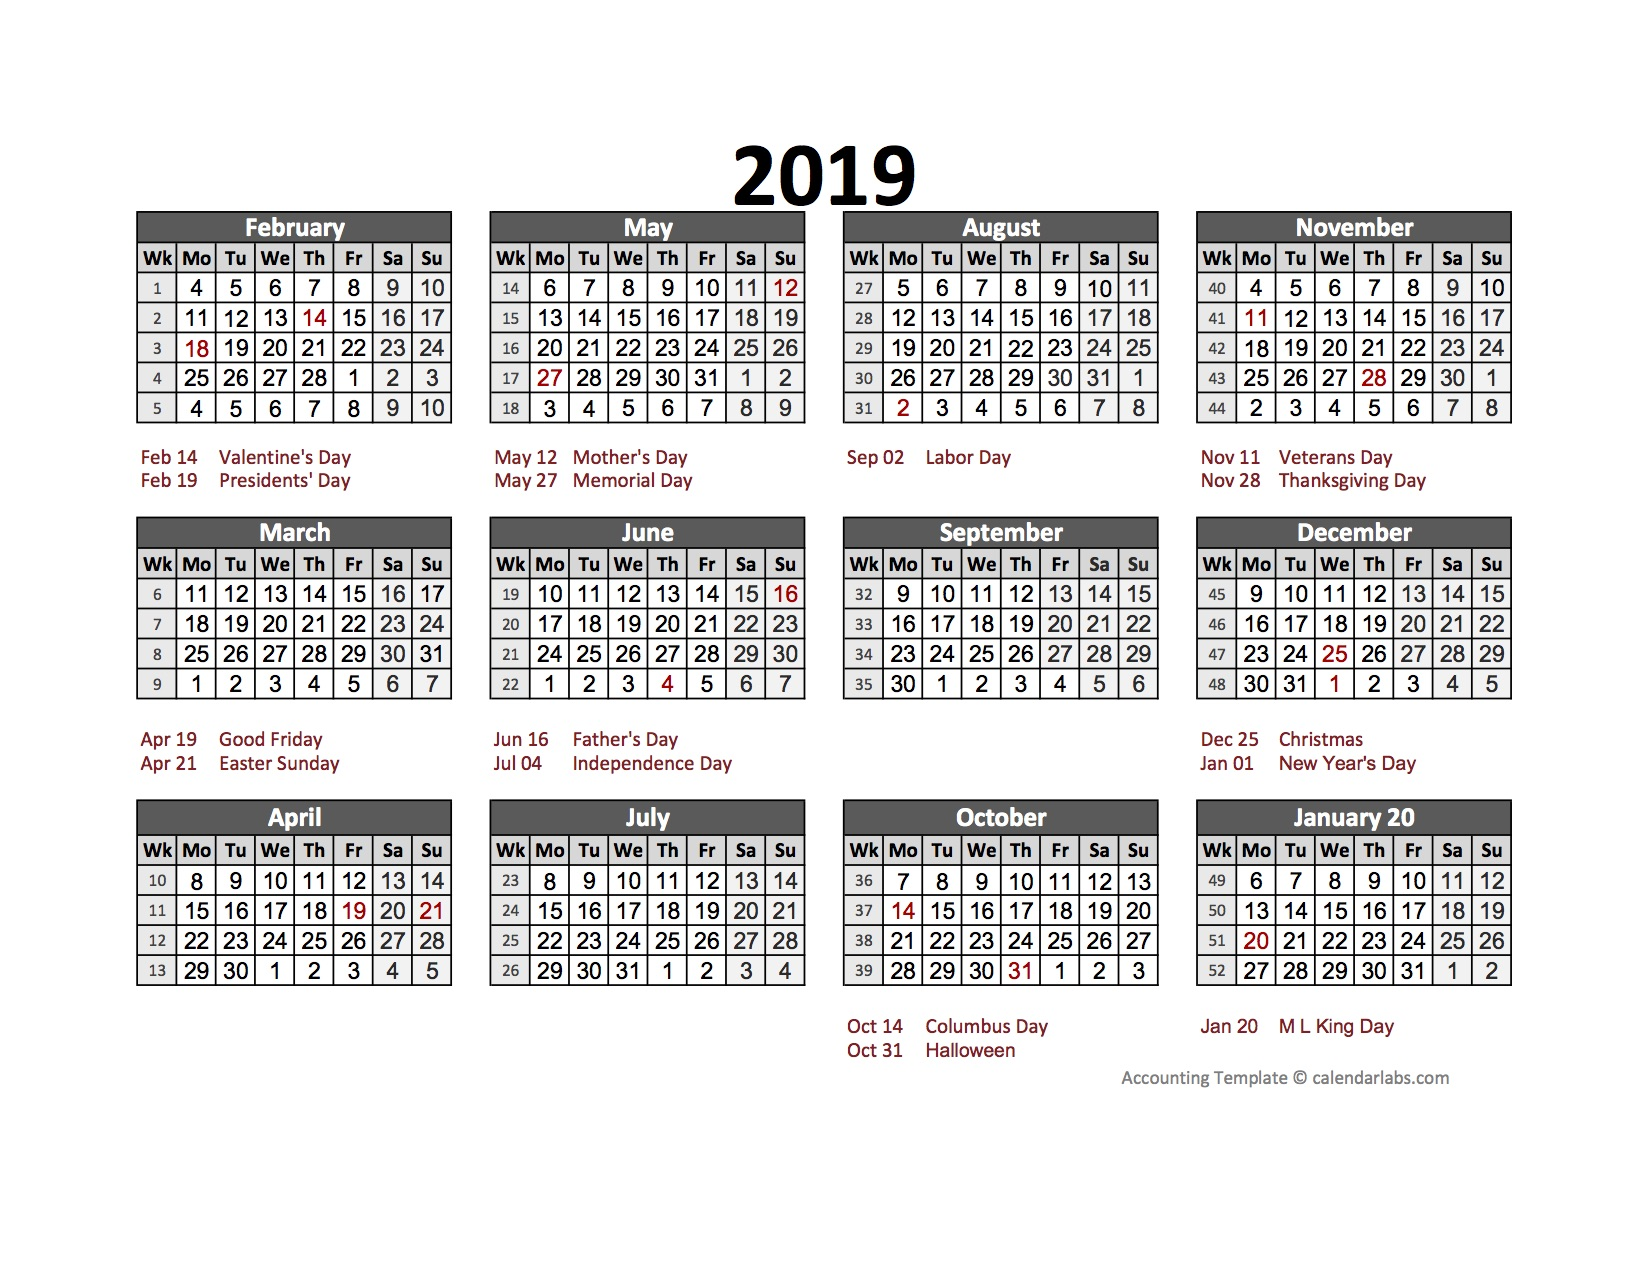 2019 accounting calendar 5-4-4